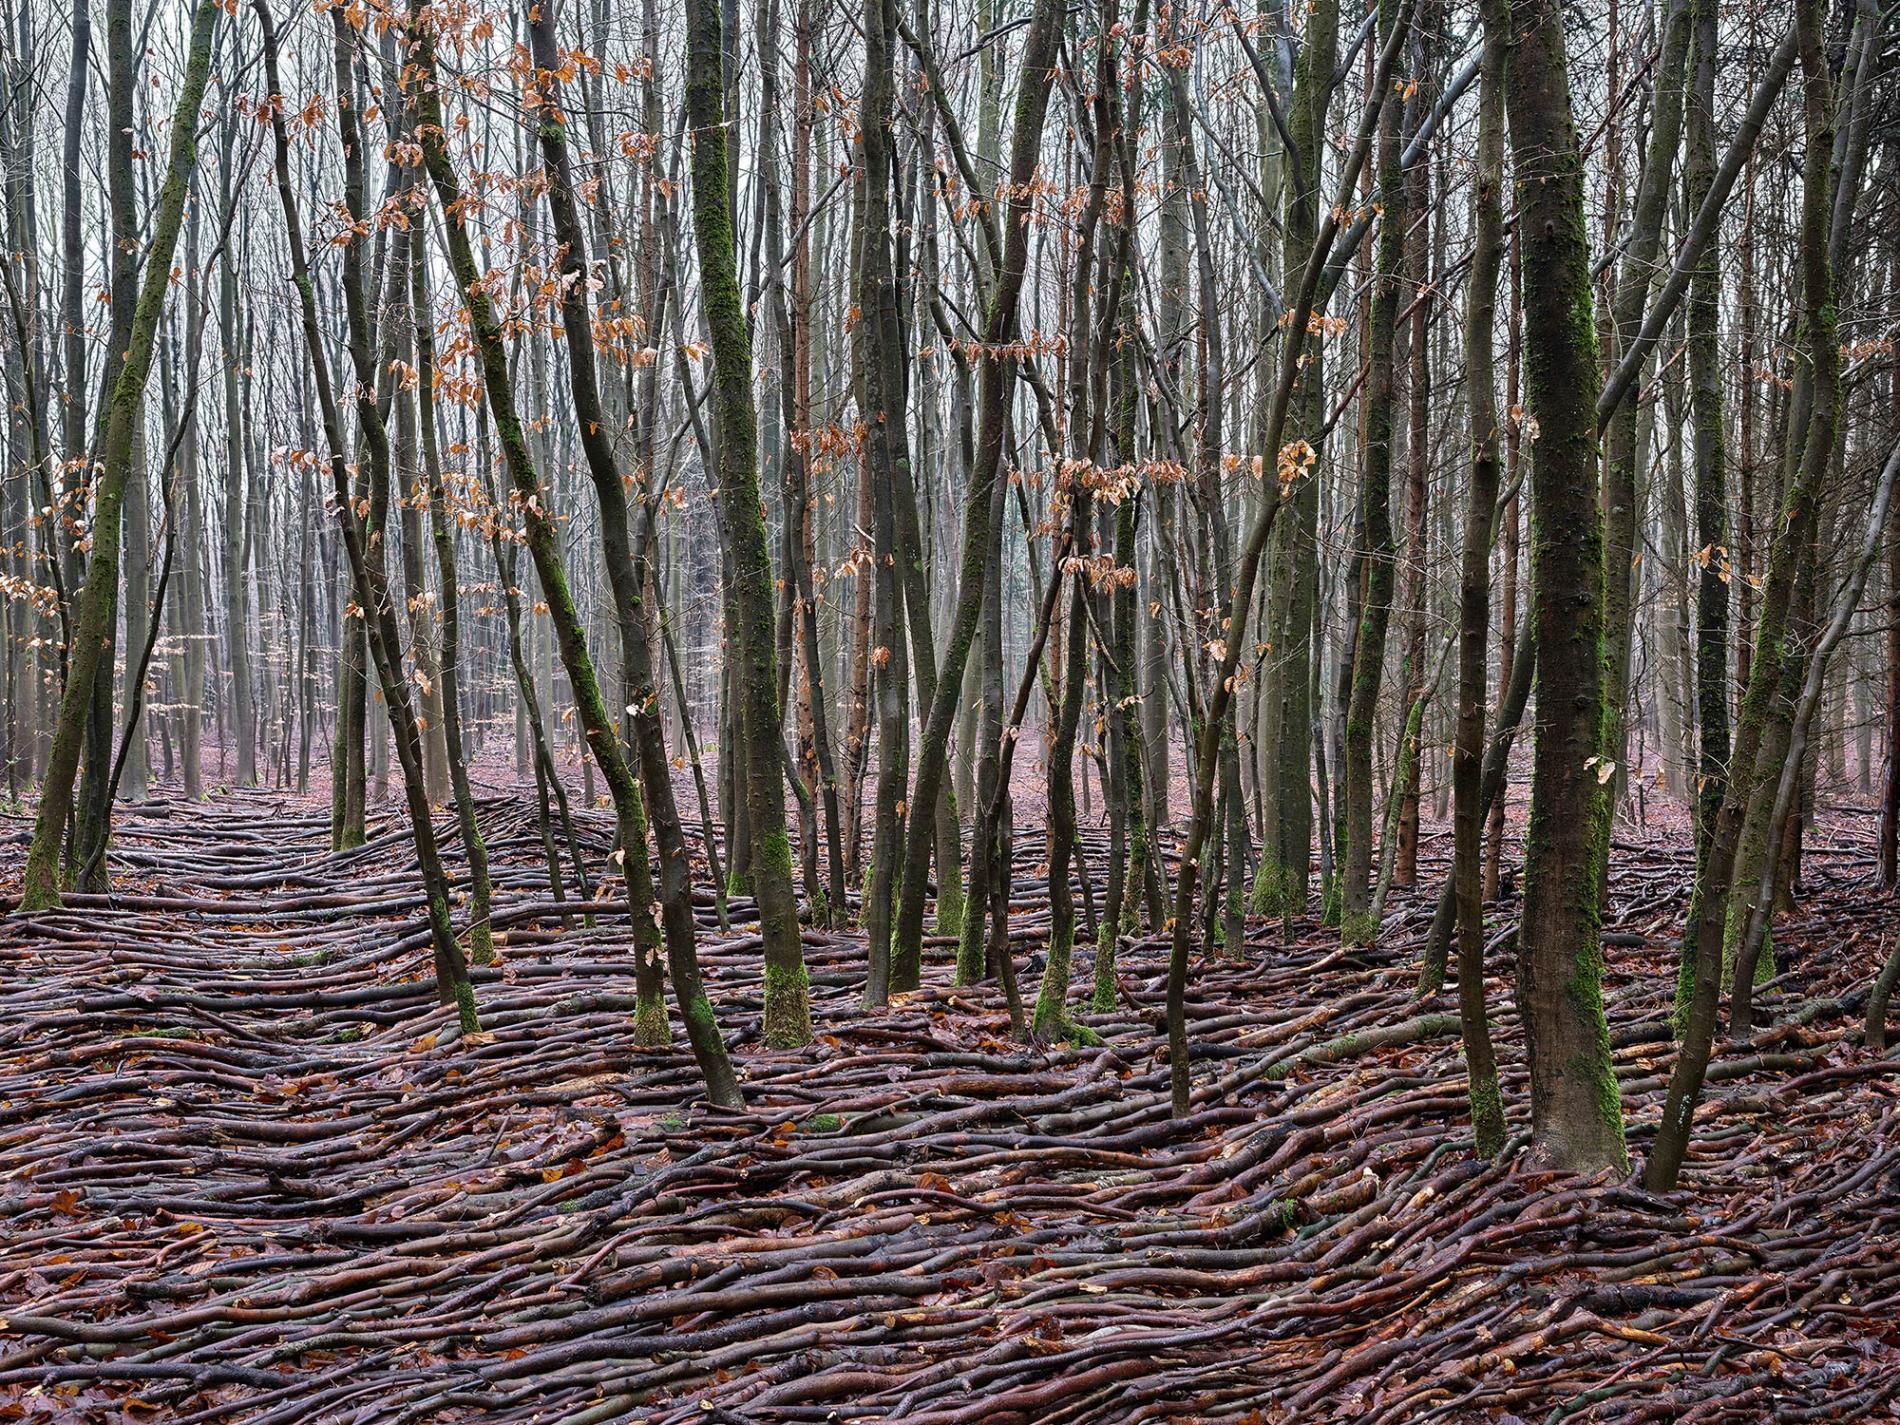 olas de madera fotografia Jörg Gläscher ondulado